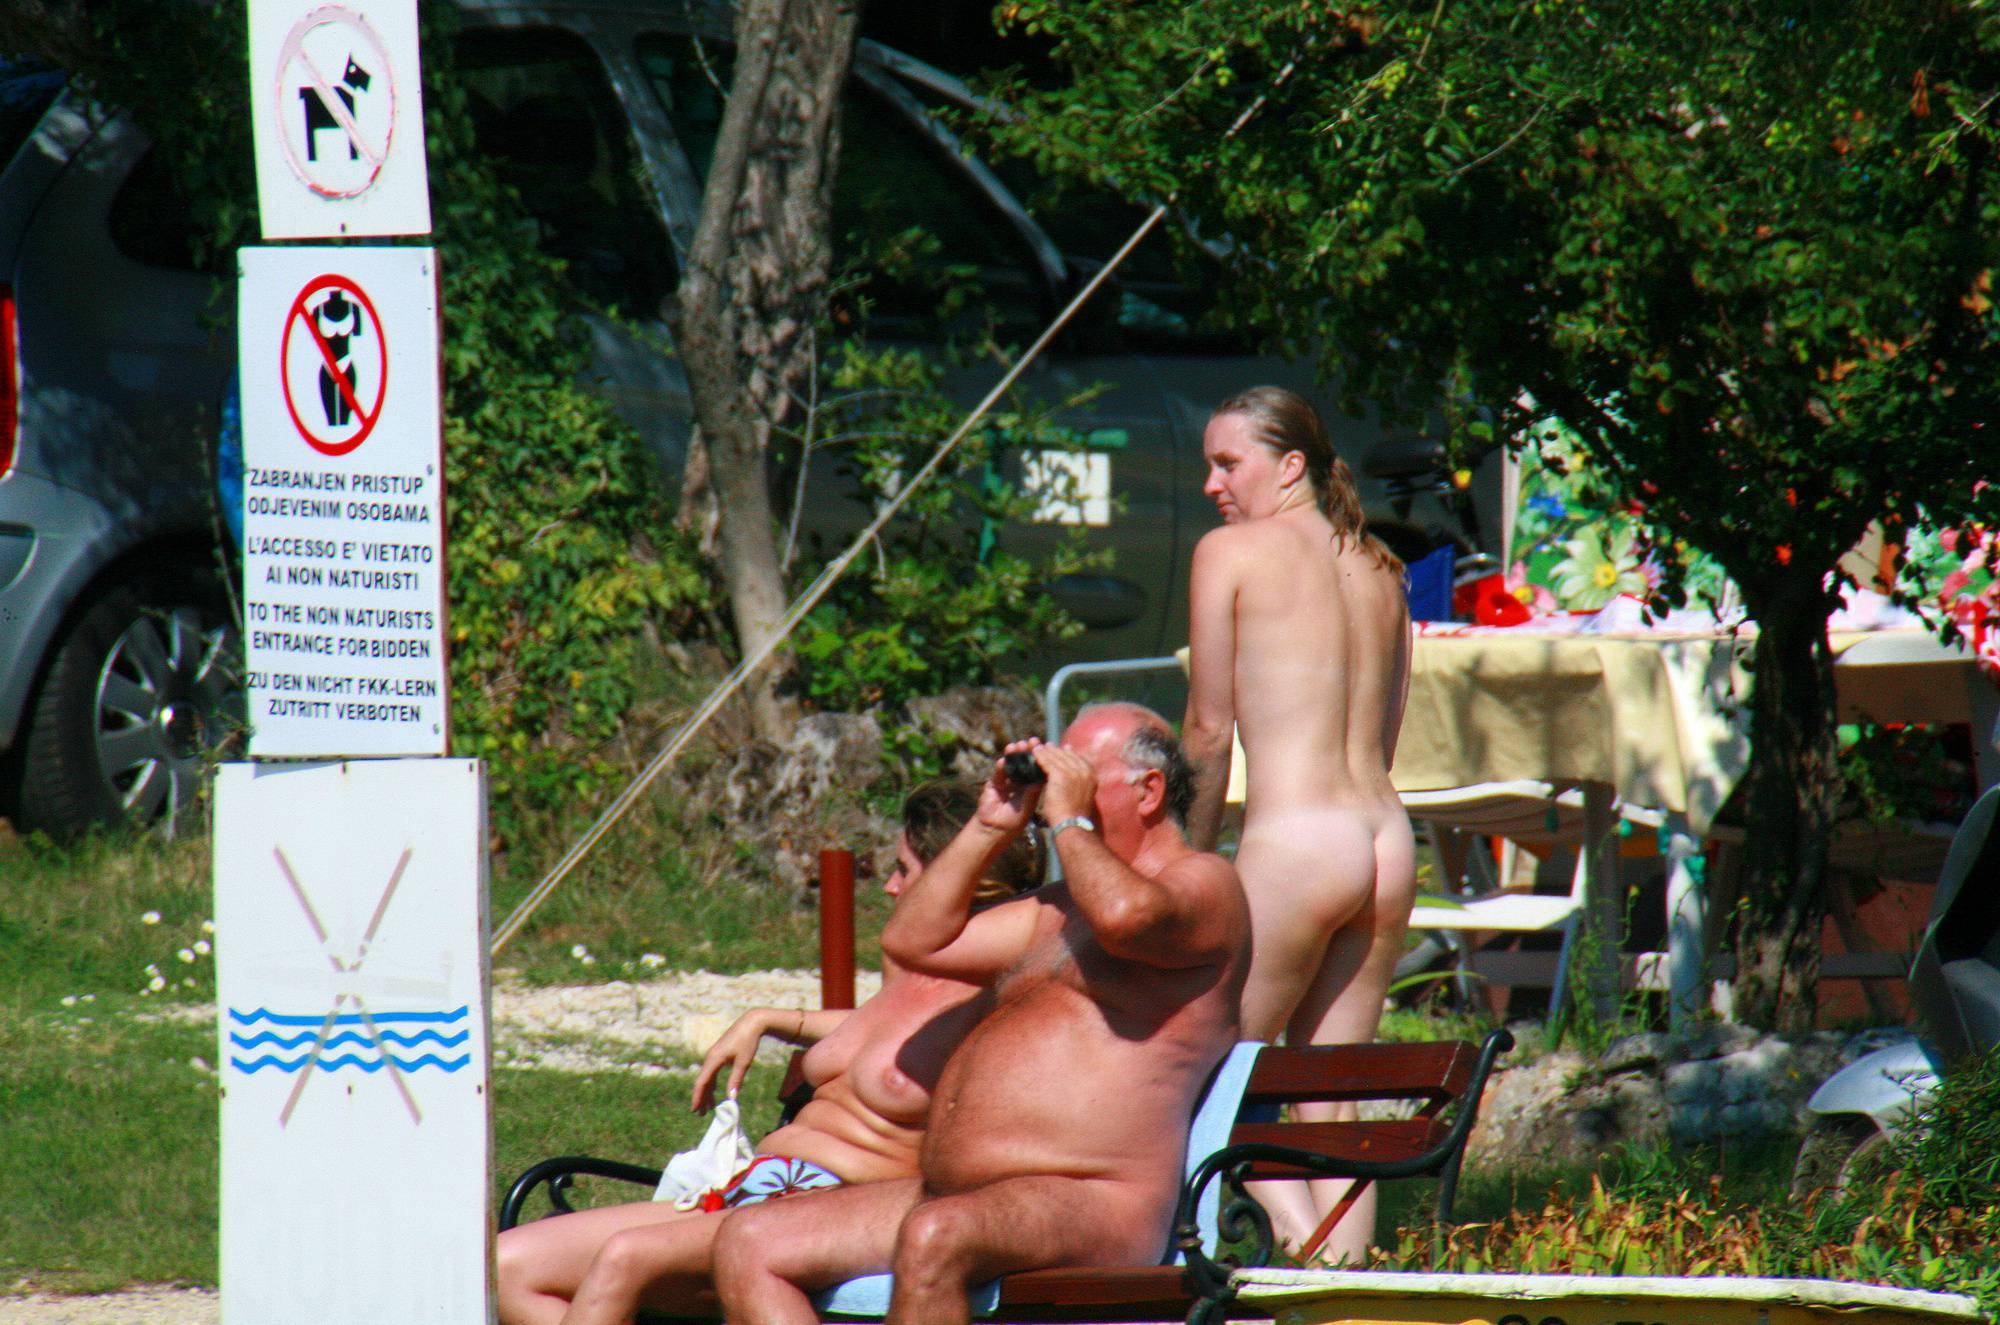 Purenudism Photos-Ula FKK Couple's Shower - 2